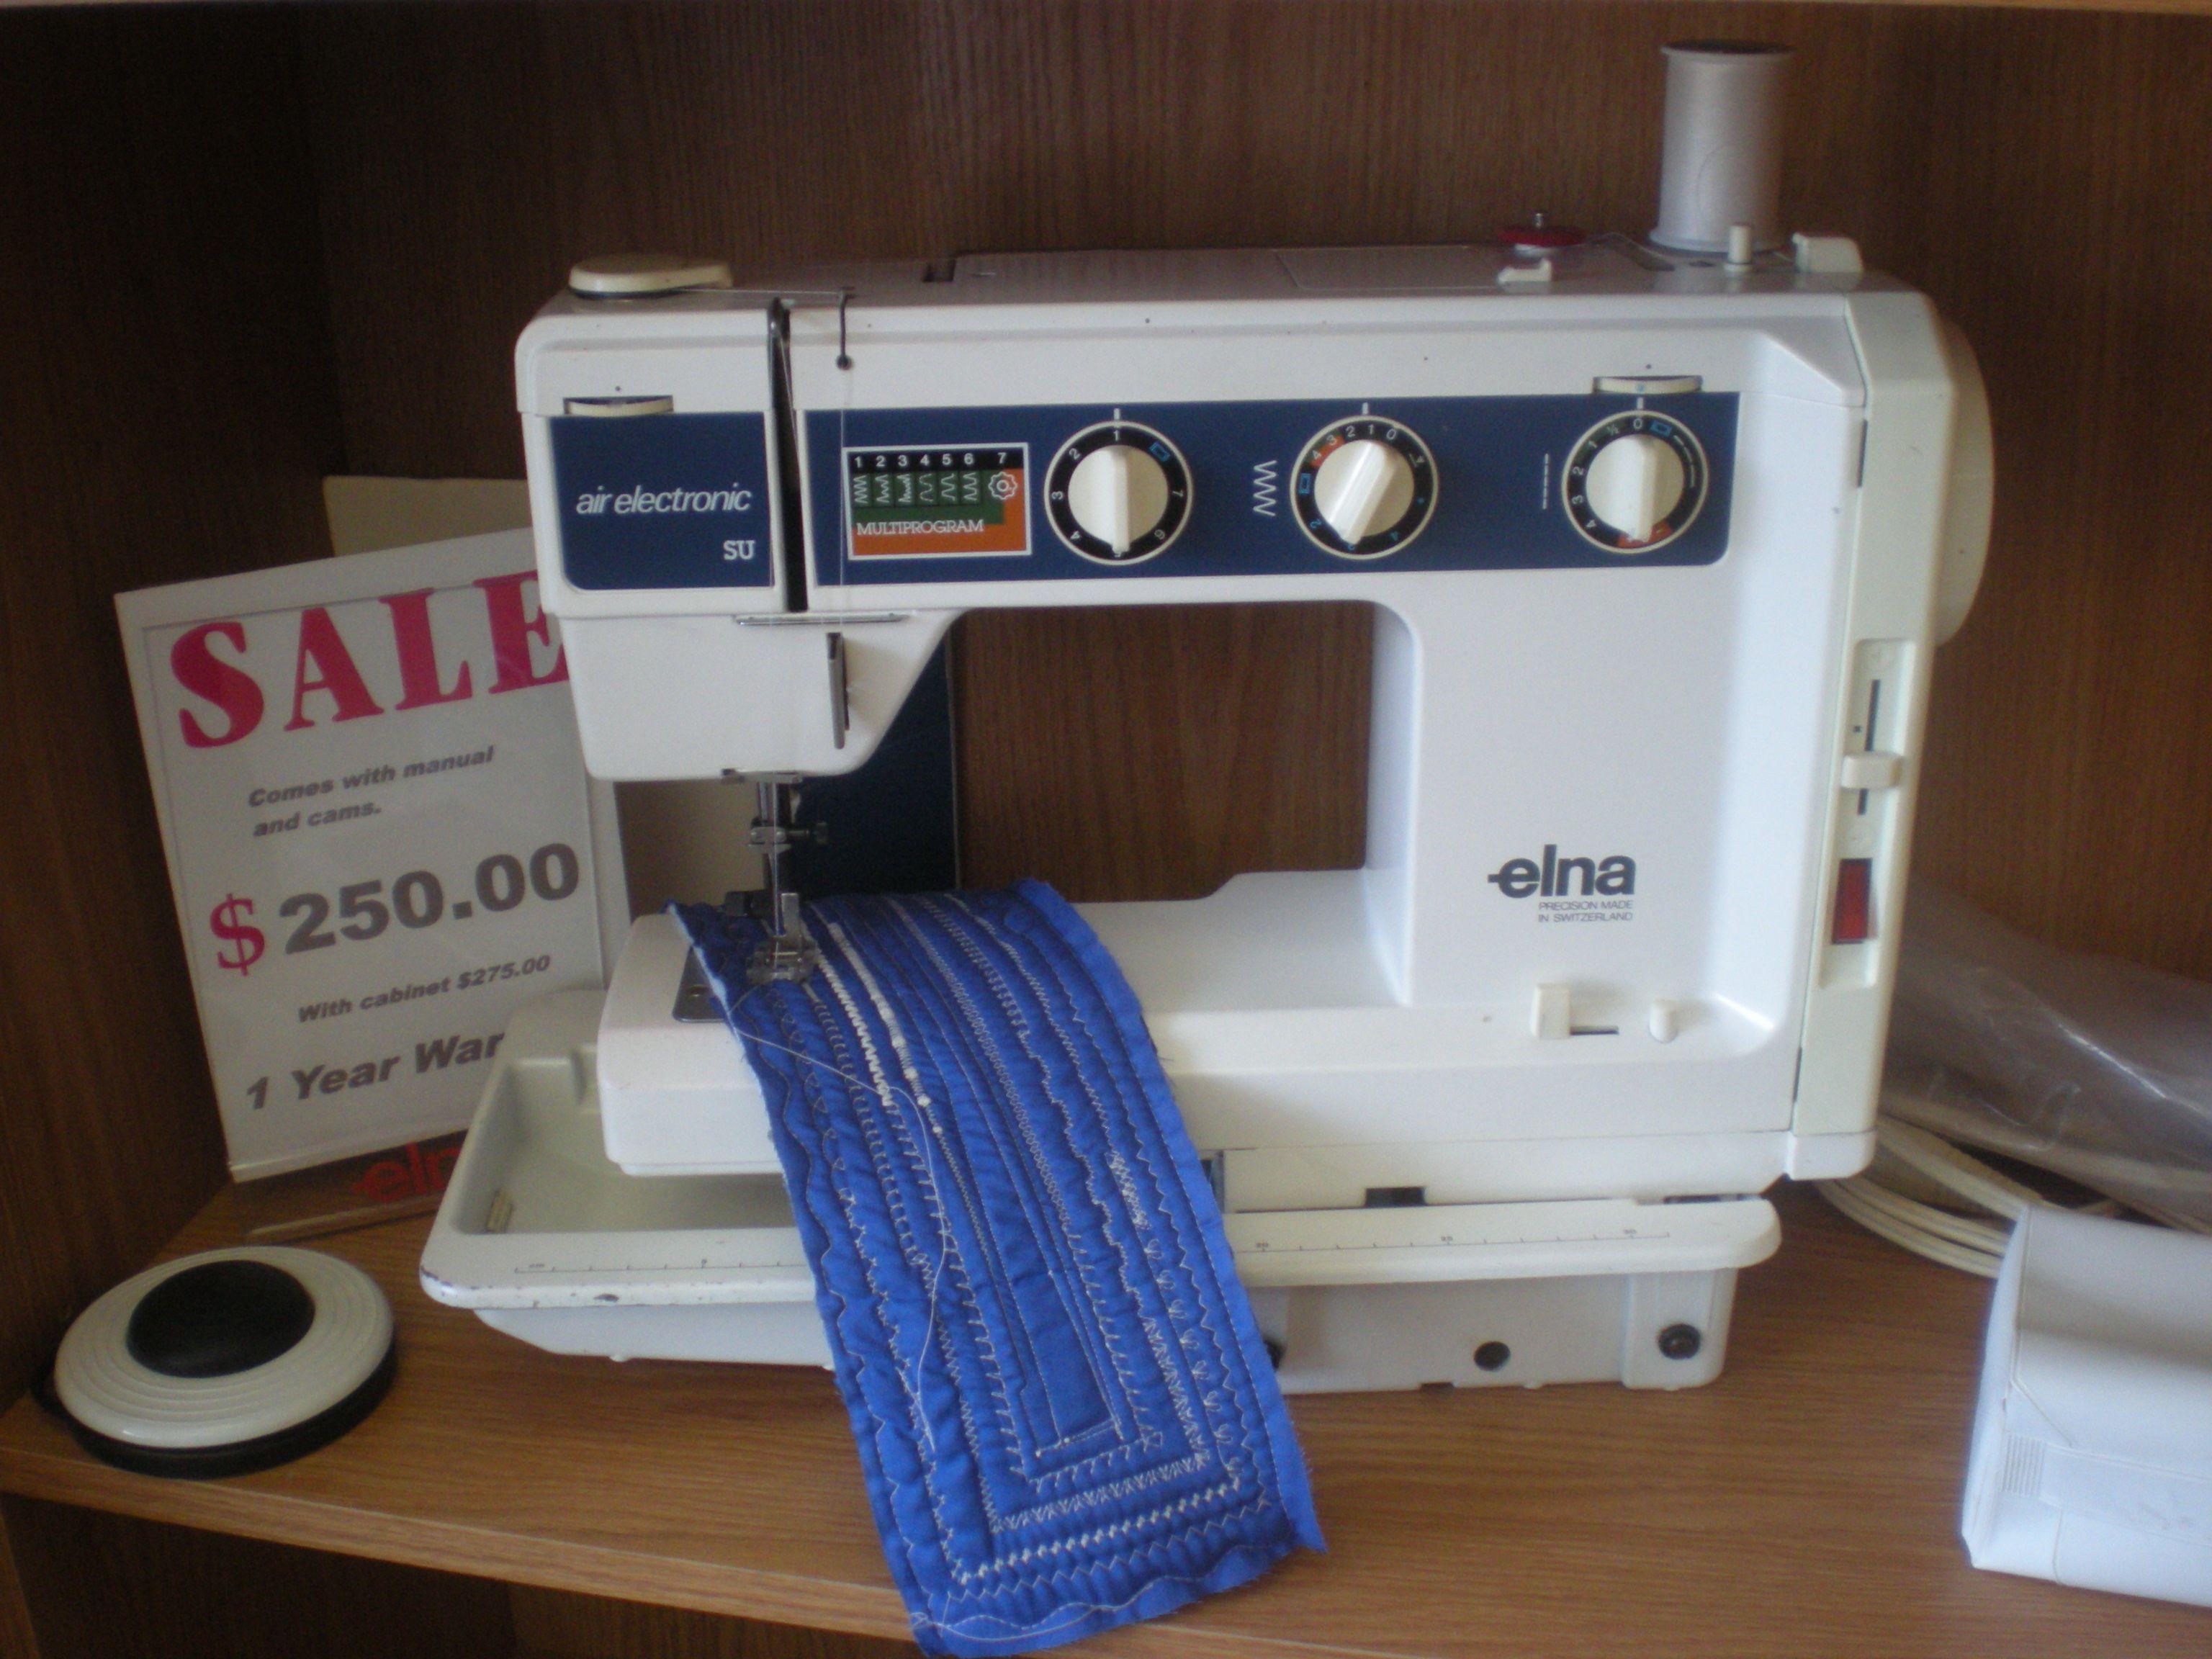 elna air electronic model su with duplex base to go into a cabinet rh pinterest com Elna Supermatic Sewing Machine Manual Elna Automatic Sewing Machine